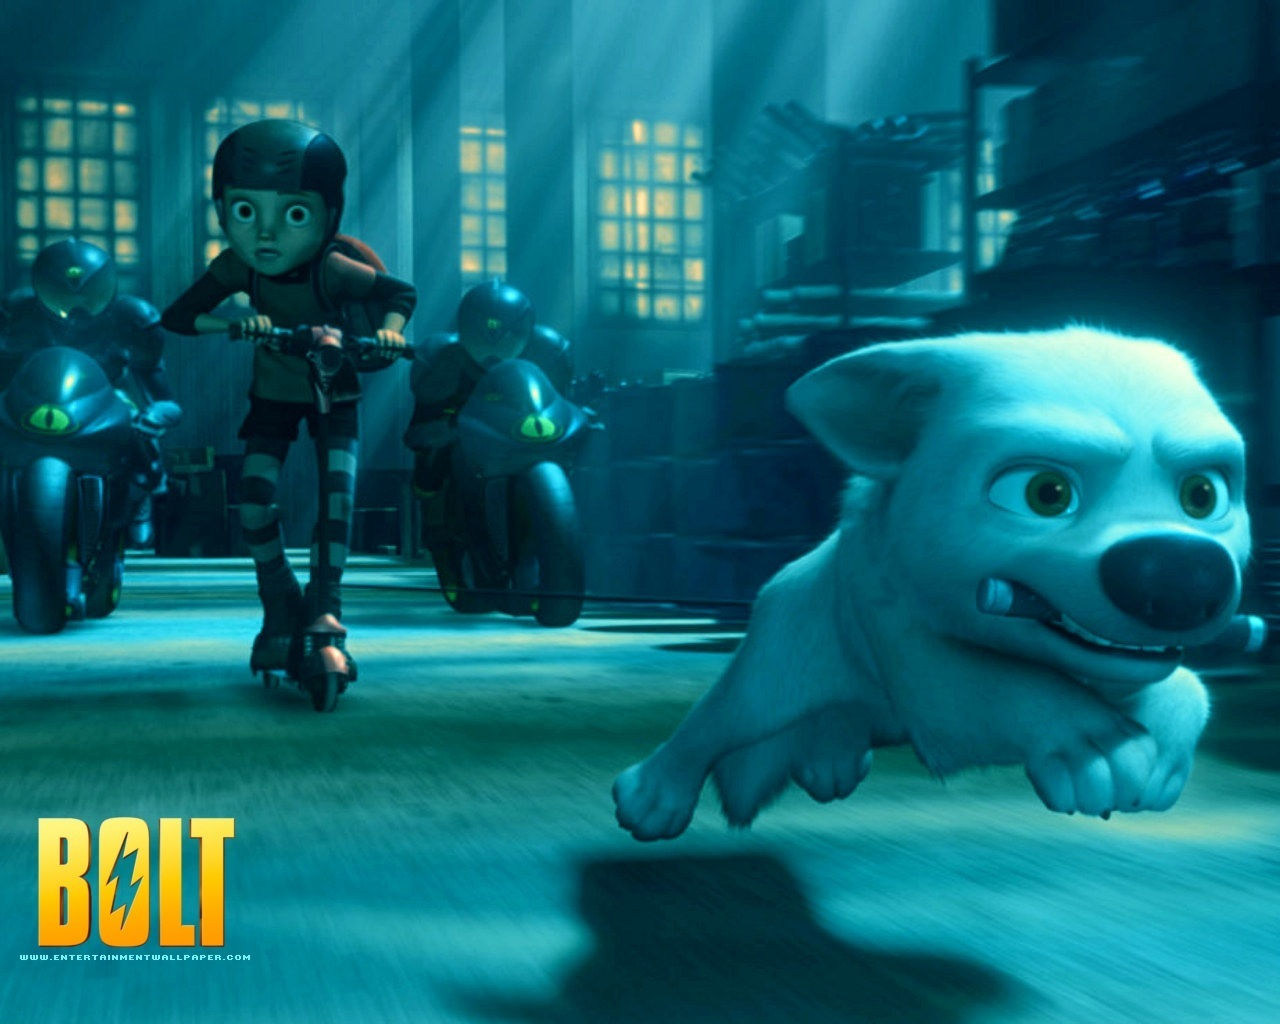 Disneys Bolt images Bolt Wallpapers wallpaper photos 6251553 1280x1024